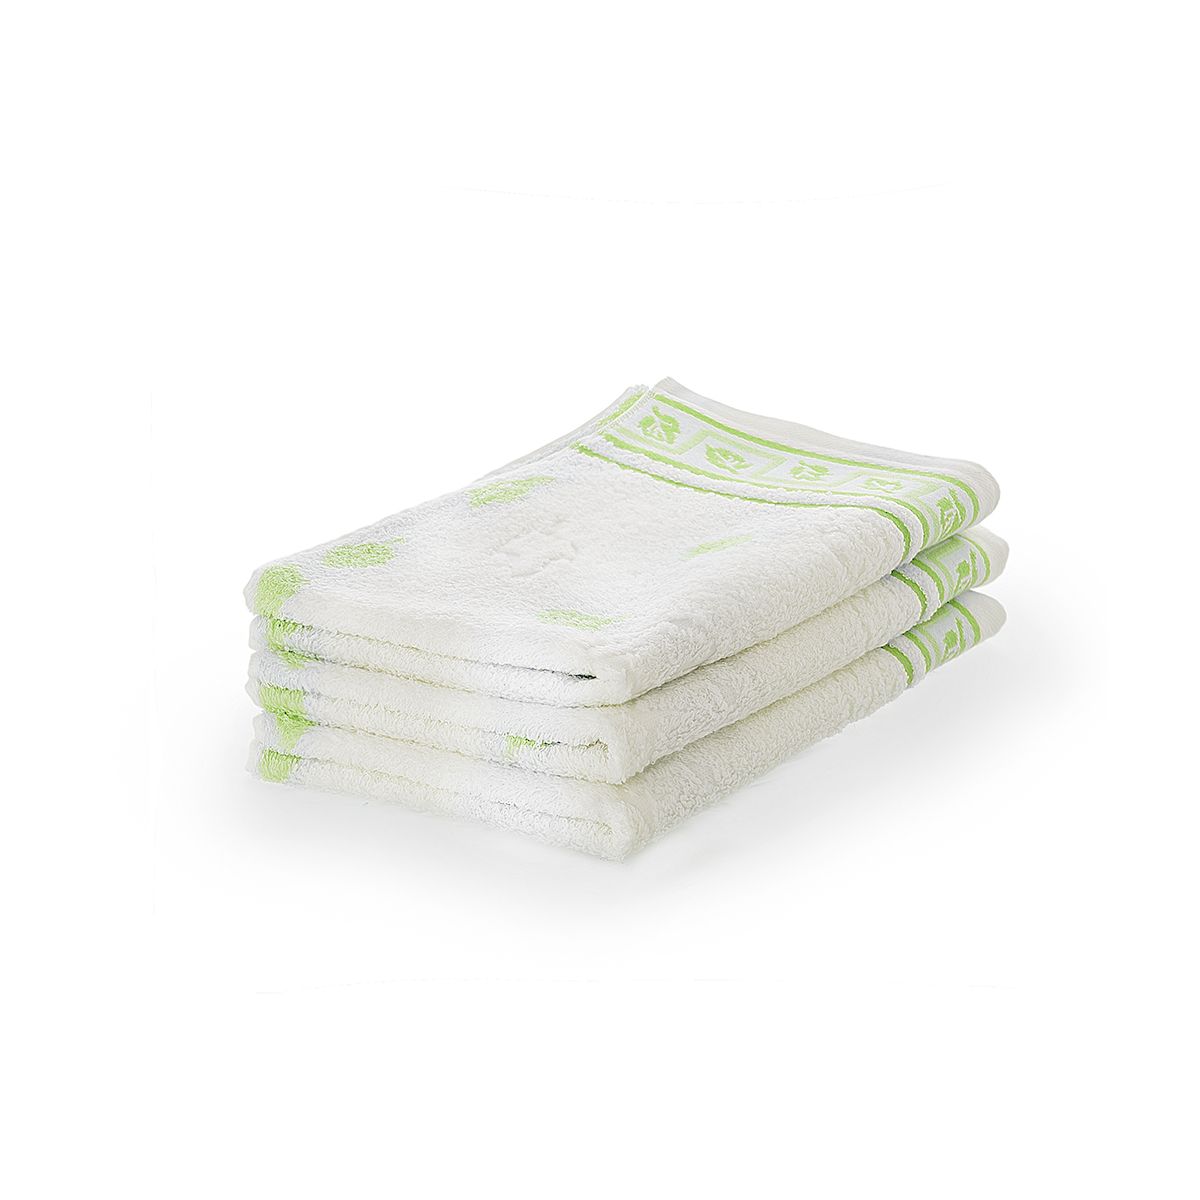 Полотенце Листопад Зеленый, размер 50х90 смМахровые полотенца<br>Плотность ткани:480 г/кв. м.<br><br>Тип: Полотенце<br>Размер: 50х90<br>Материал: Махра